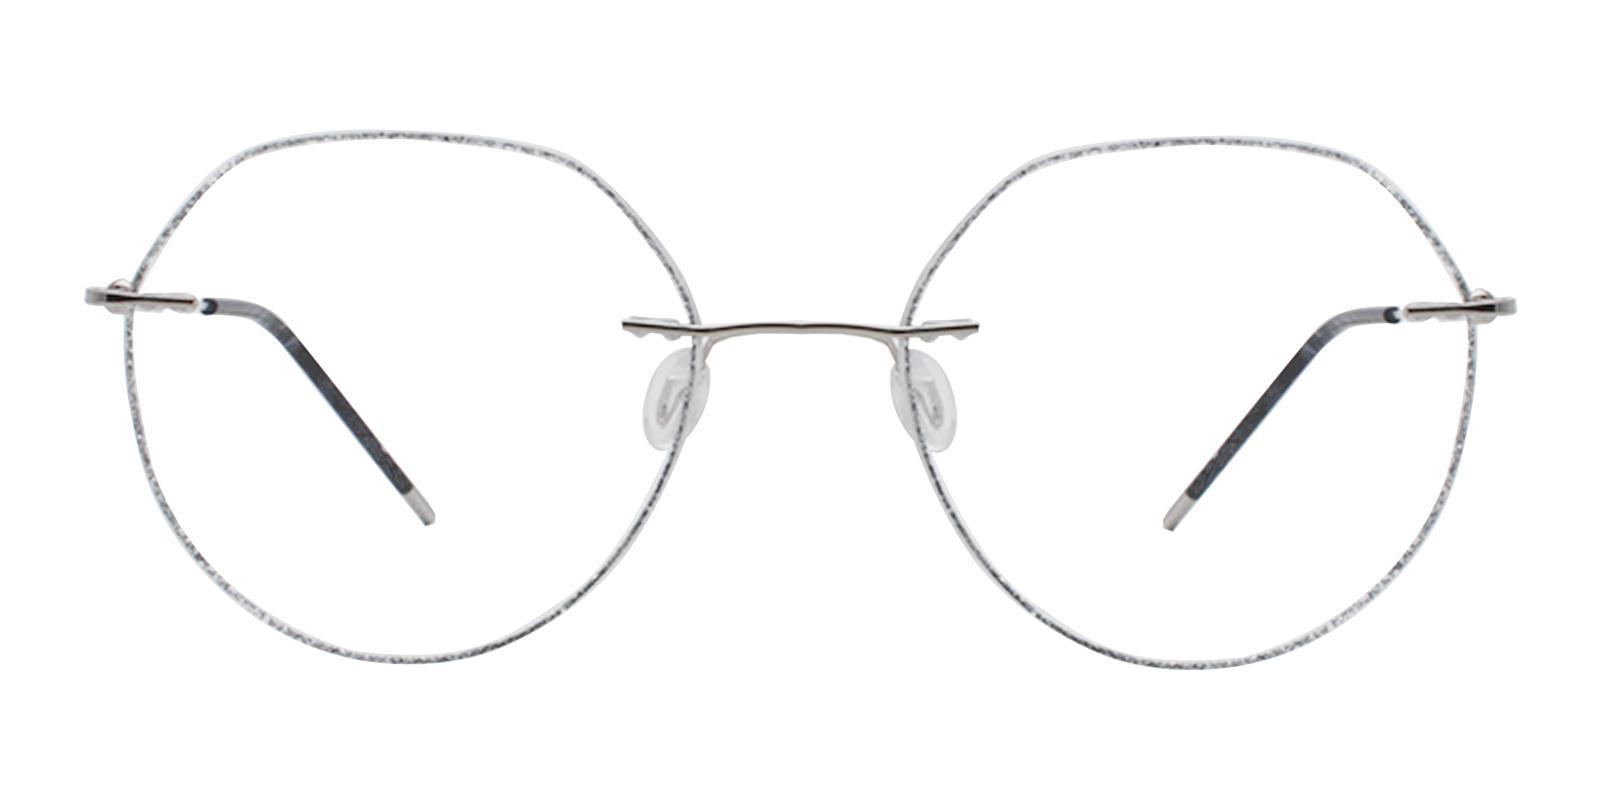 Piper Silver Titanium Eyeglasses , NosePads Frames from ABBE Glasses